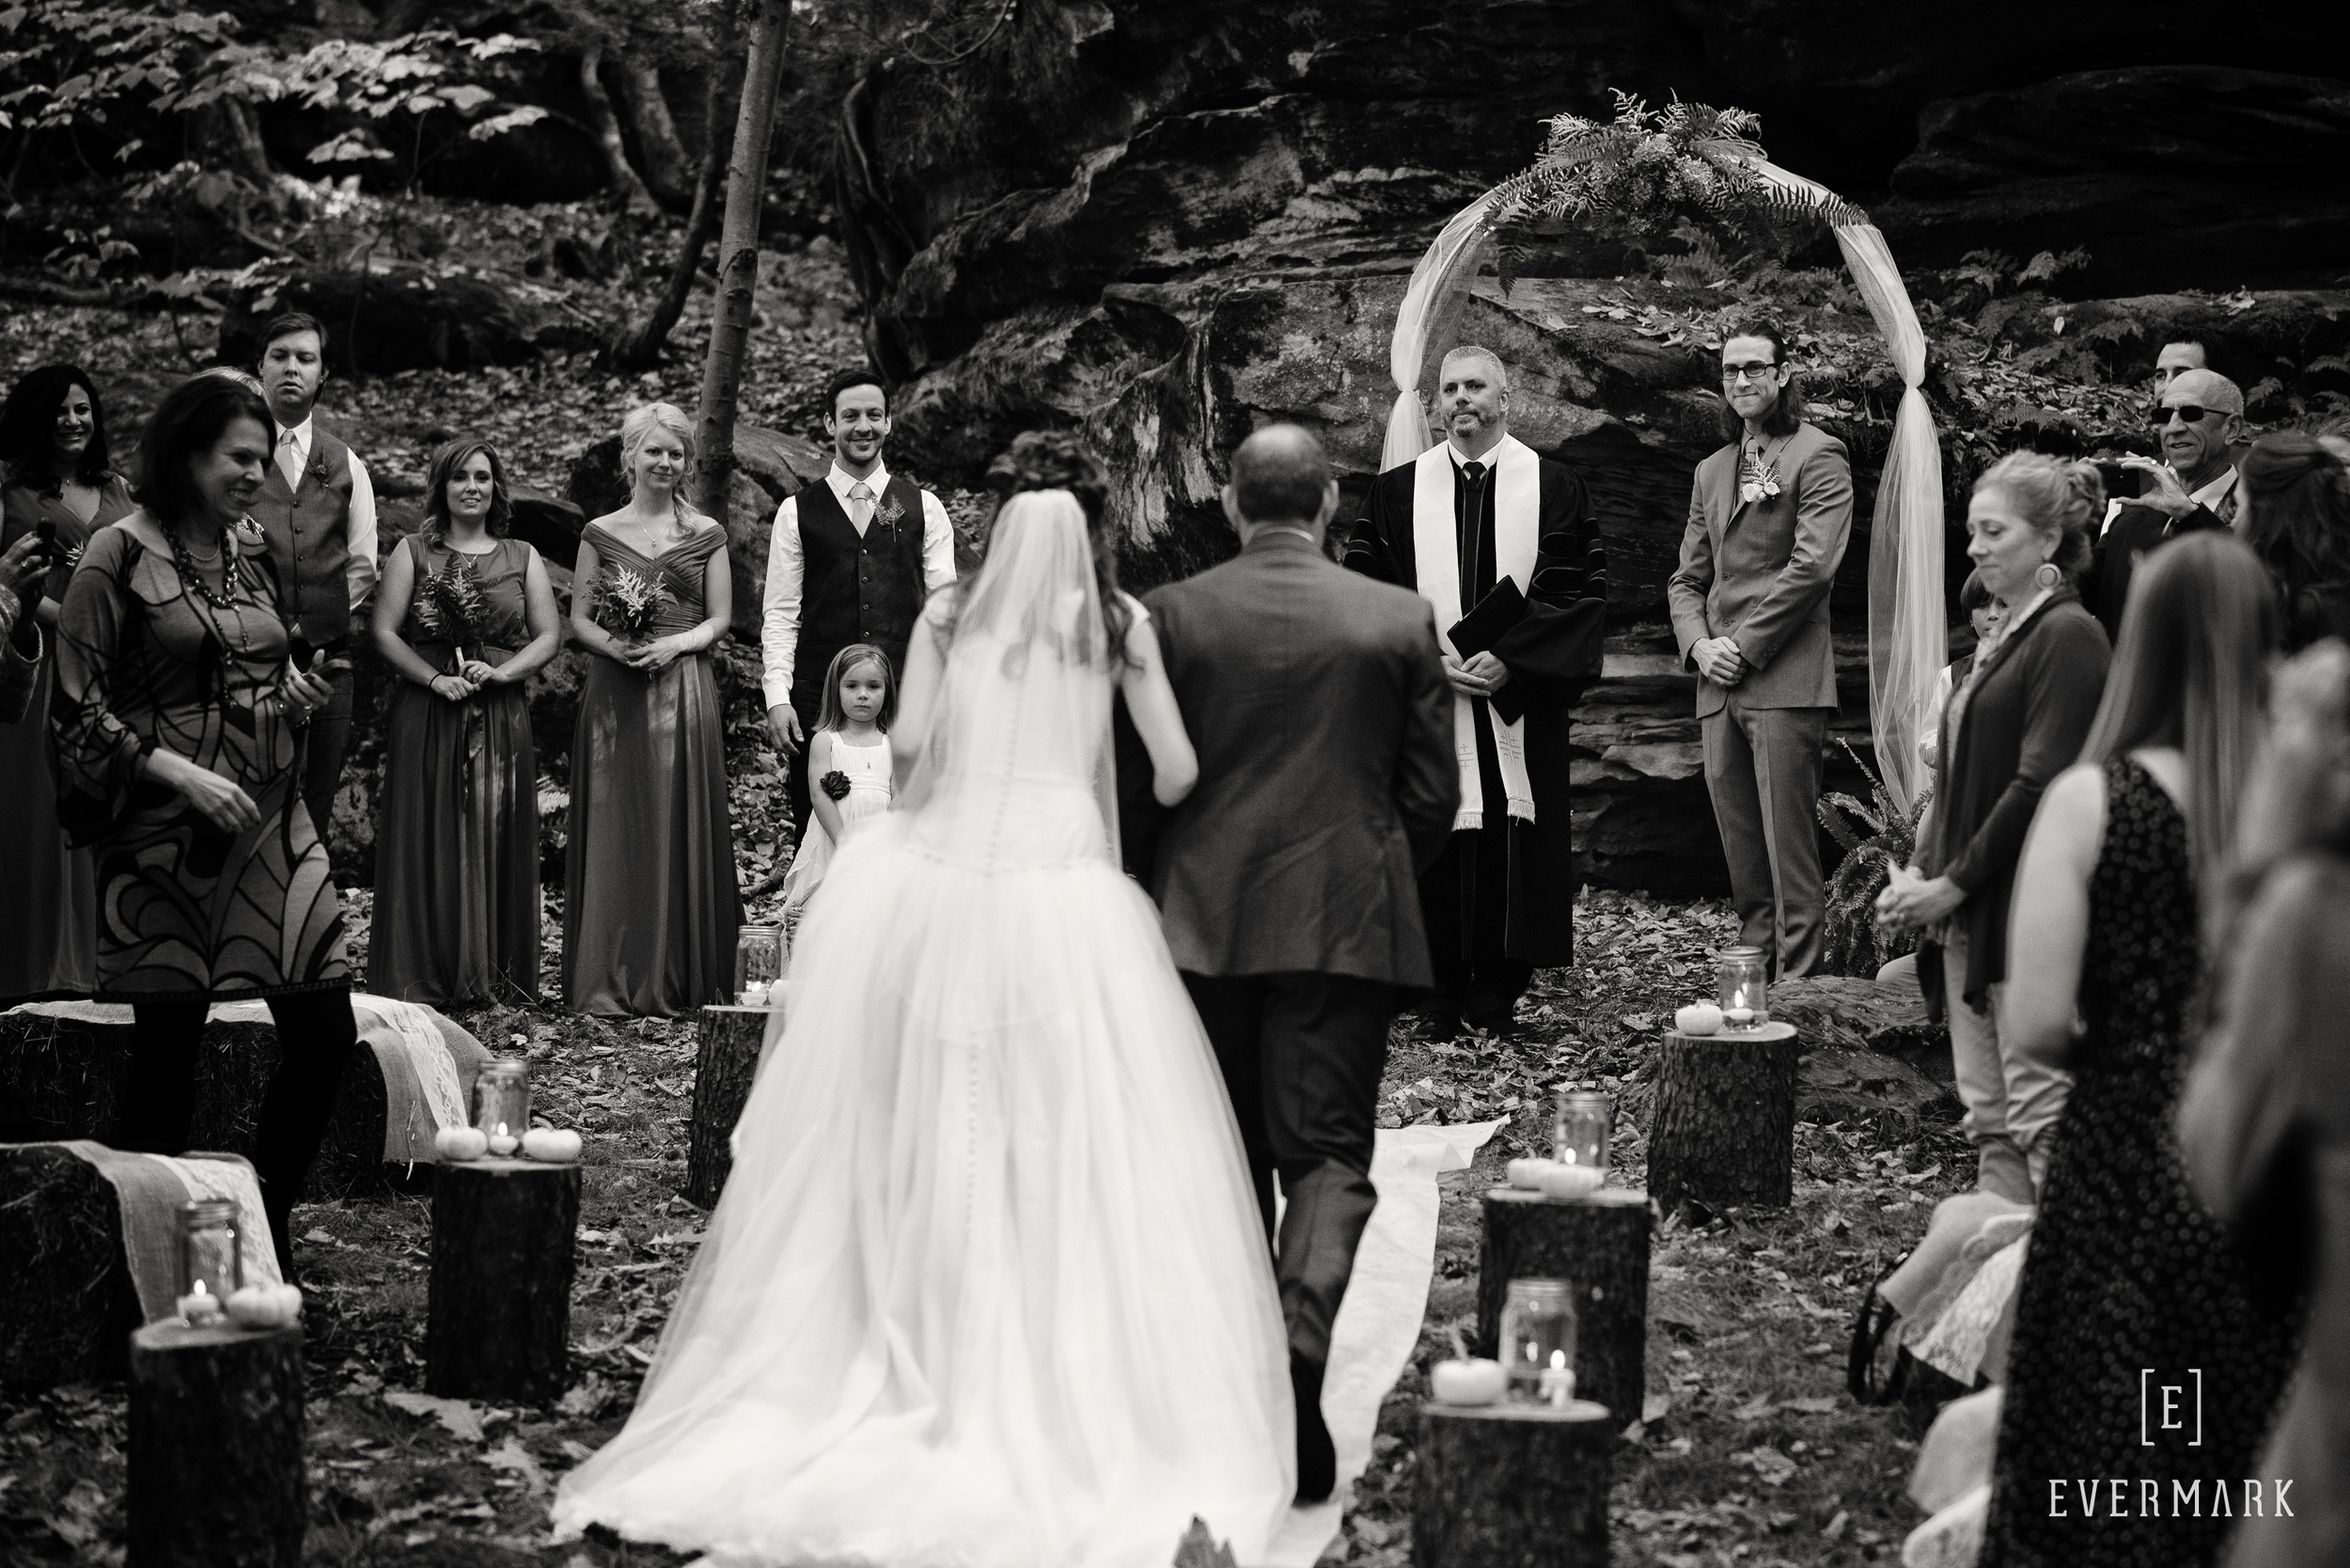 Evermark-Studios-west-virginia-wedding-018.JPG